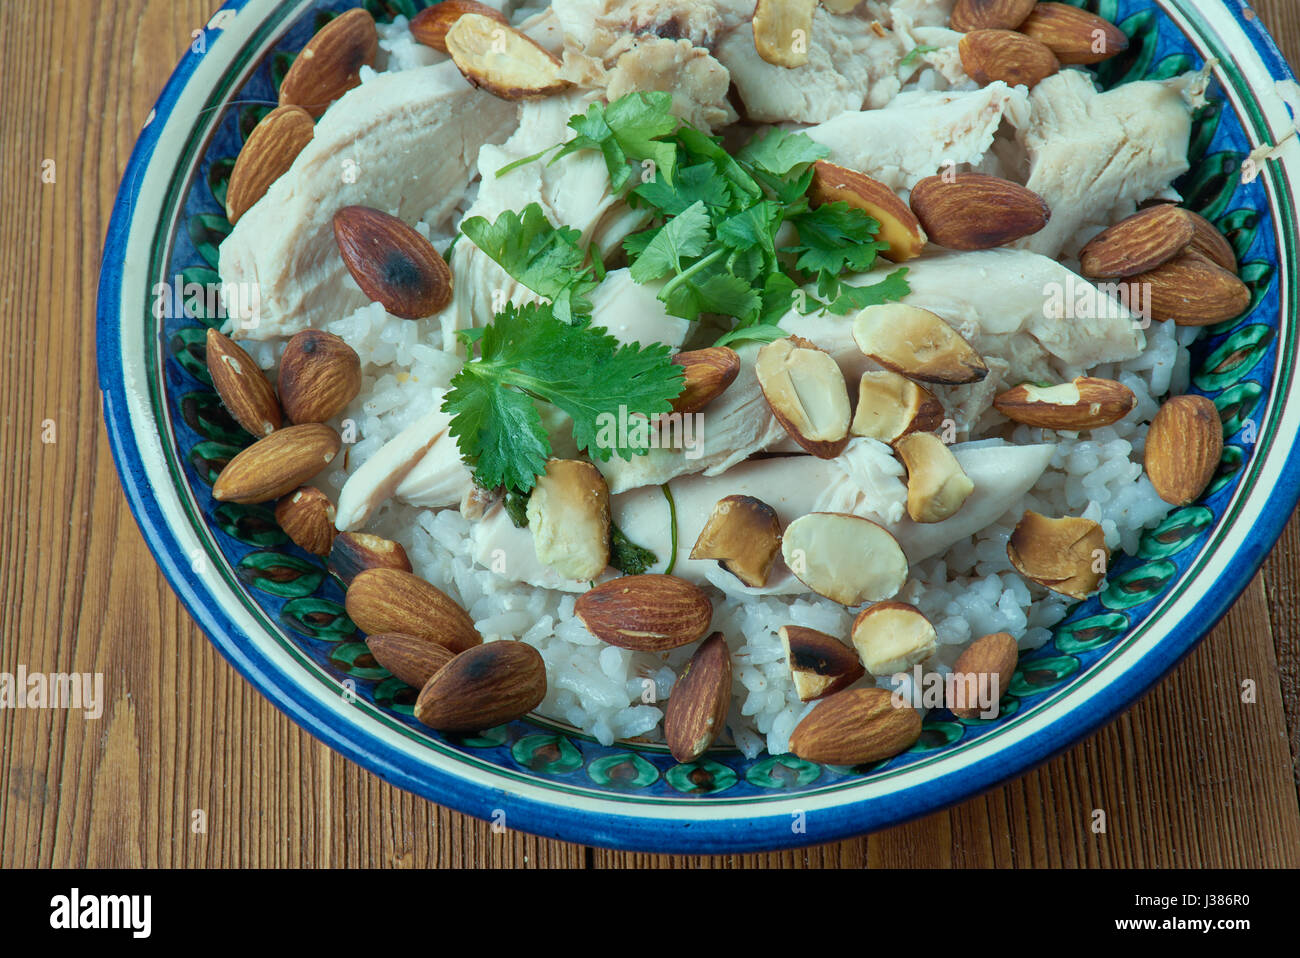 Lebanese Chicken and Rice - Fatet Dajaj - Stock Image